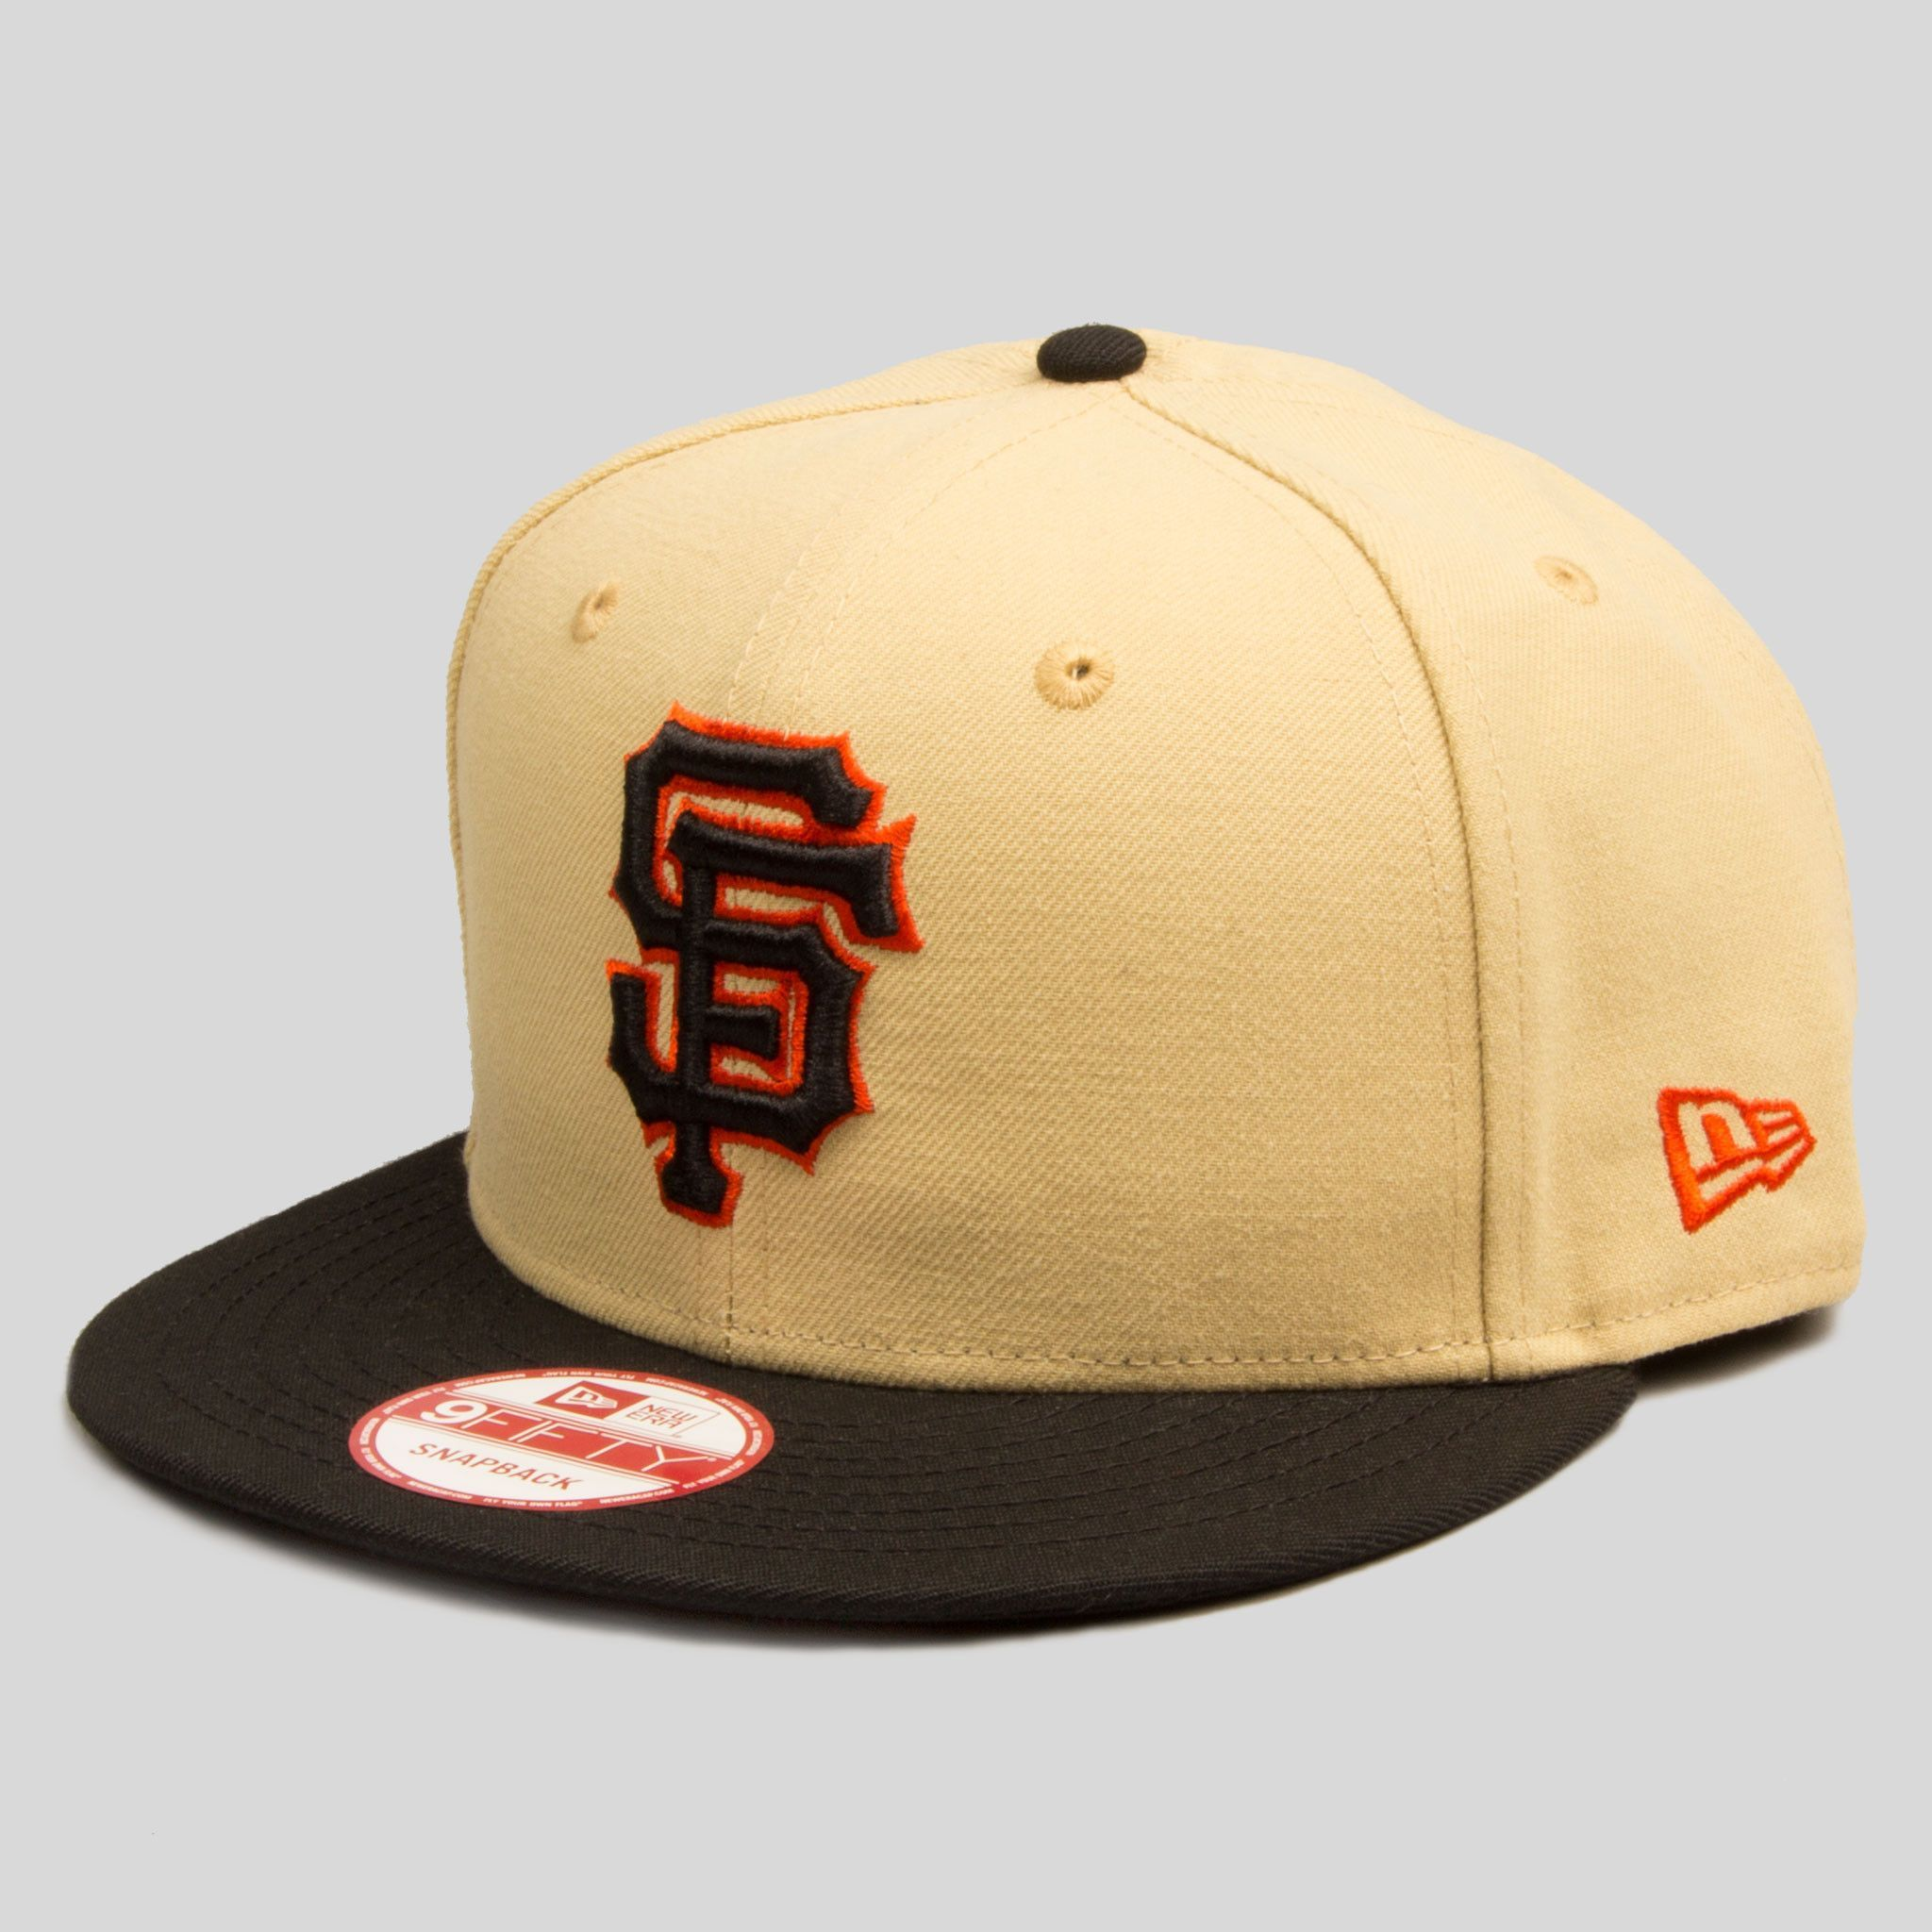 Sf Giants New Era Snapback In Nopa Tan New Era Fitted Fitted Hats New Era Snapback